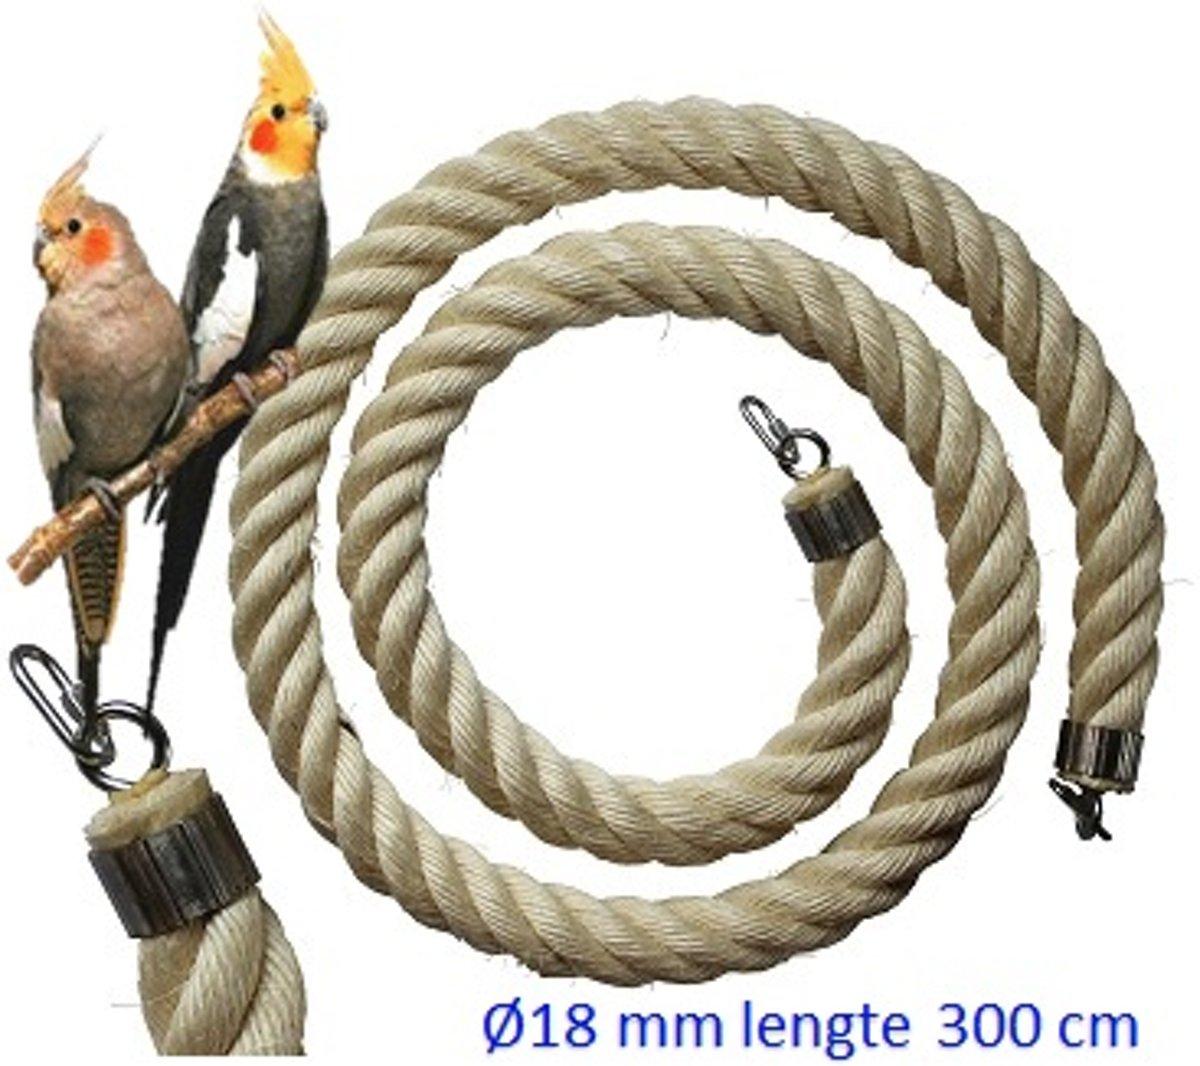 Jungle sisal touw  Ø 18 mm & 300cm lang (Vogeltouw ) kopen